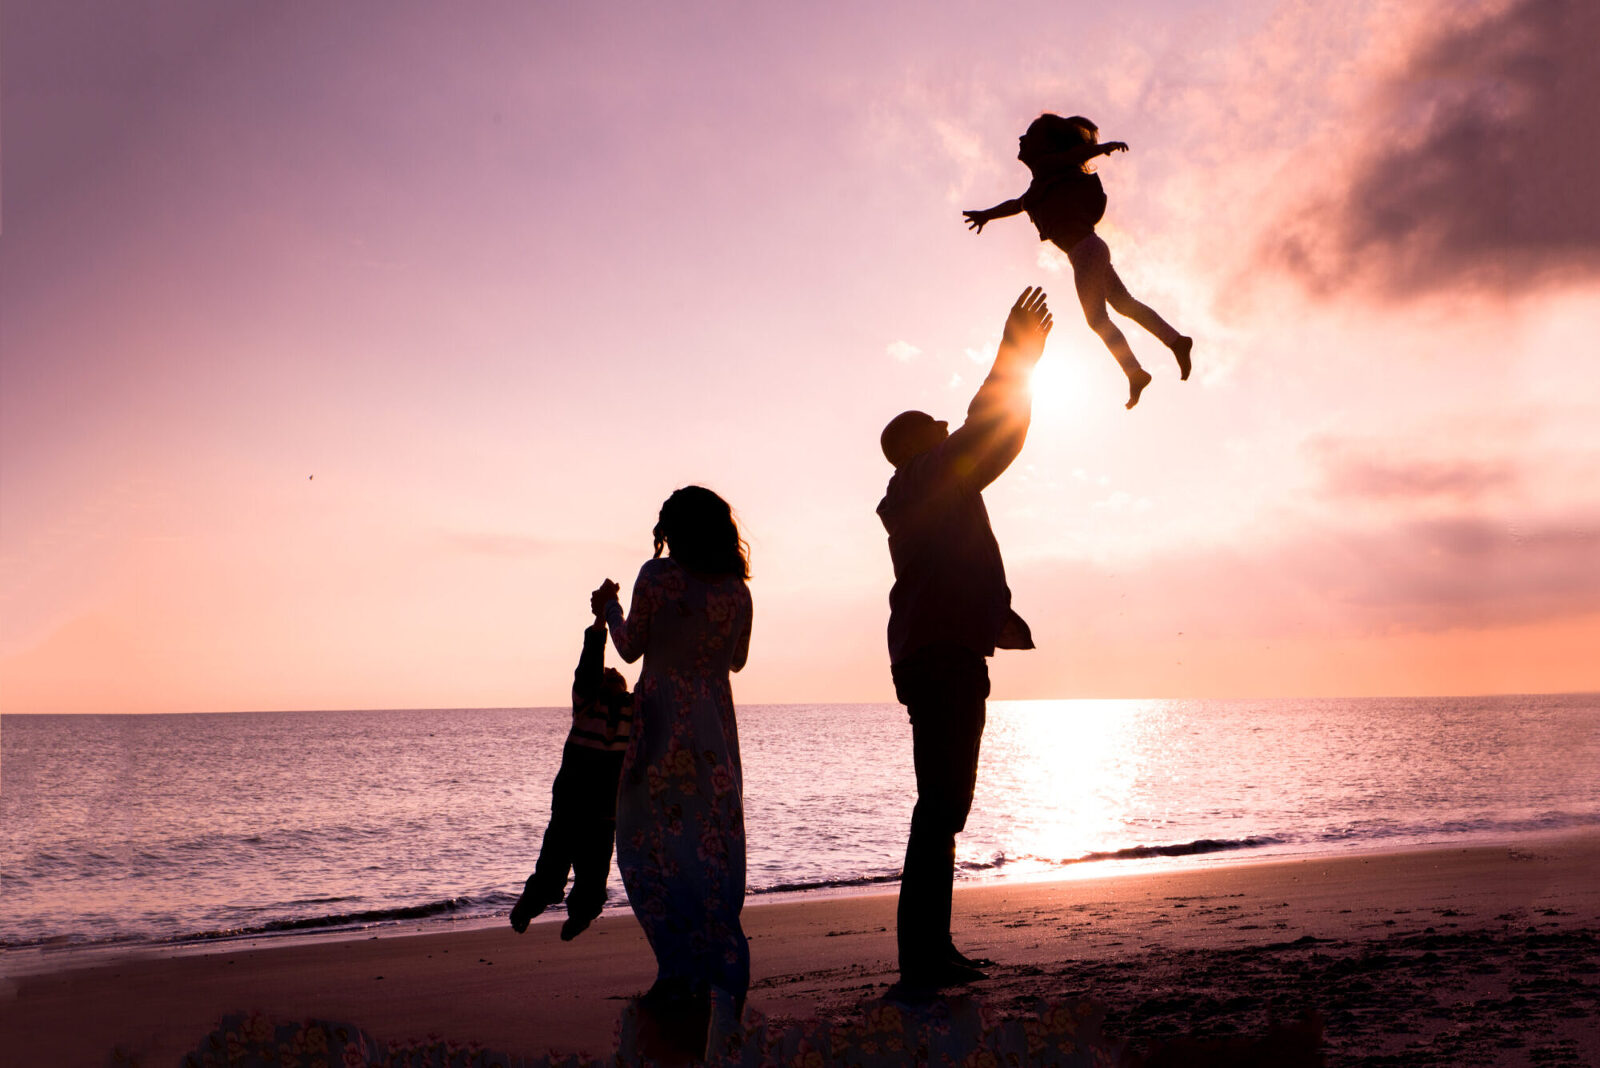 family silhouette photo